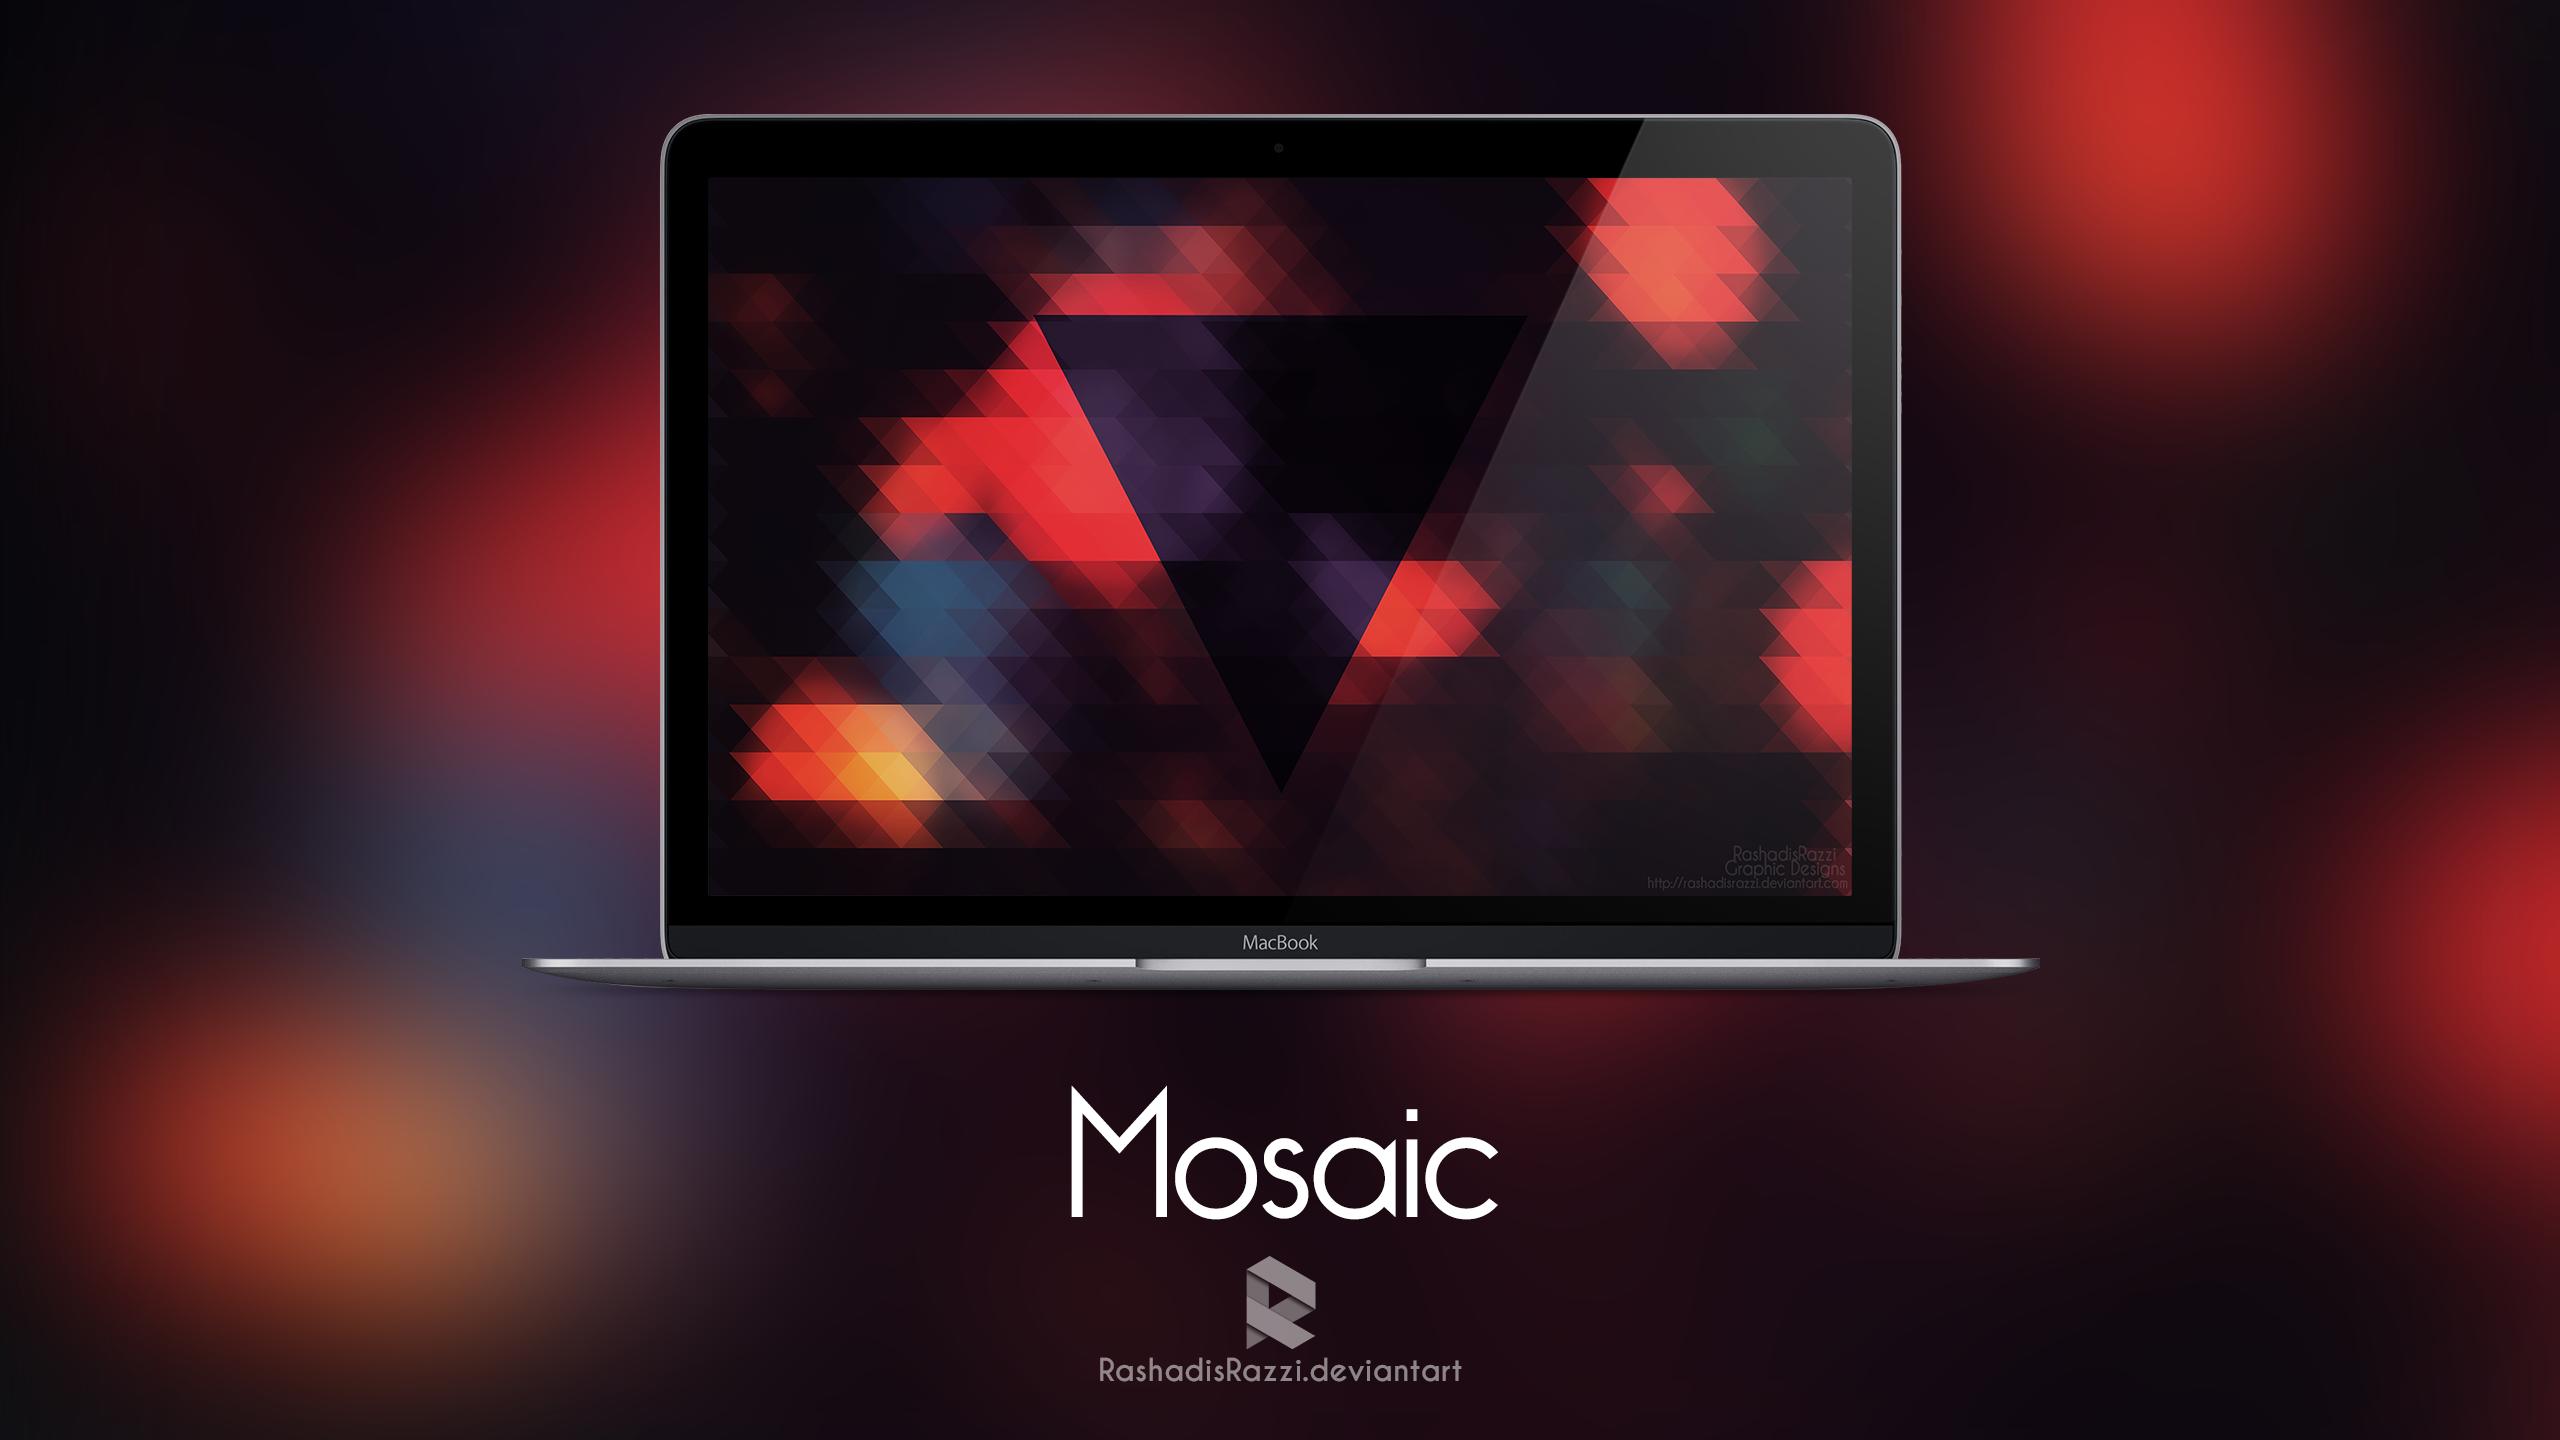 Mosaic by rashadisrazzi